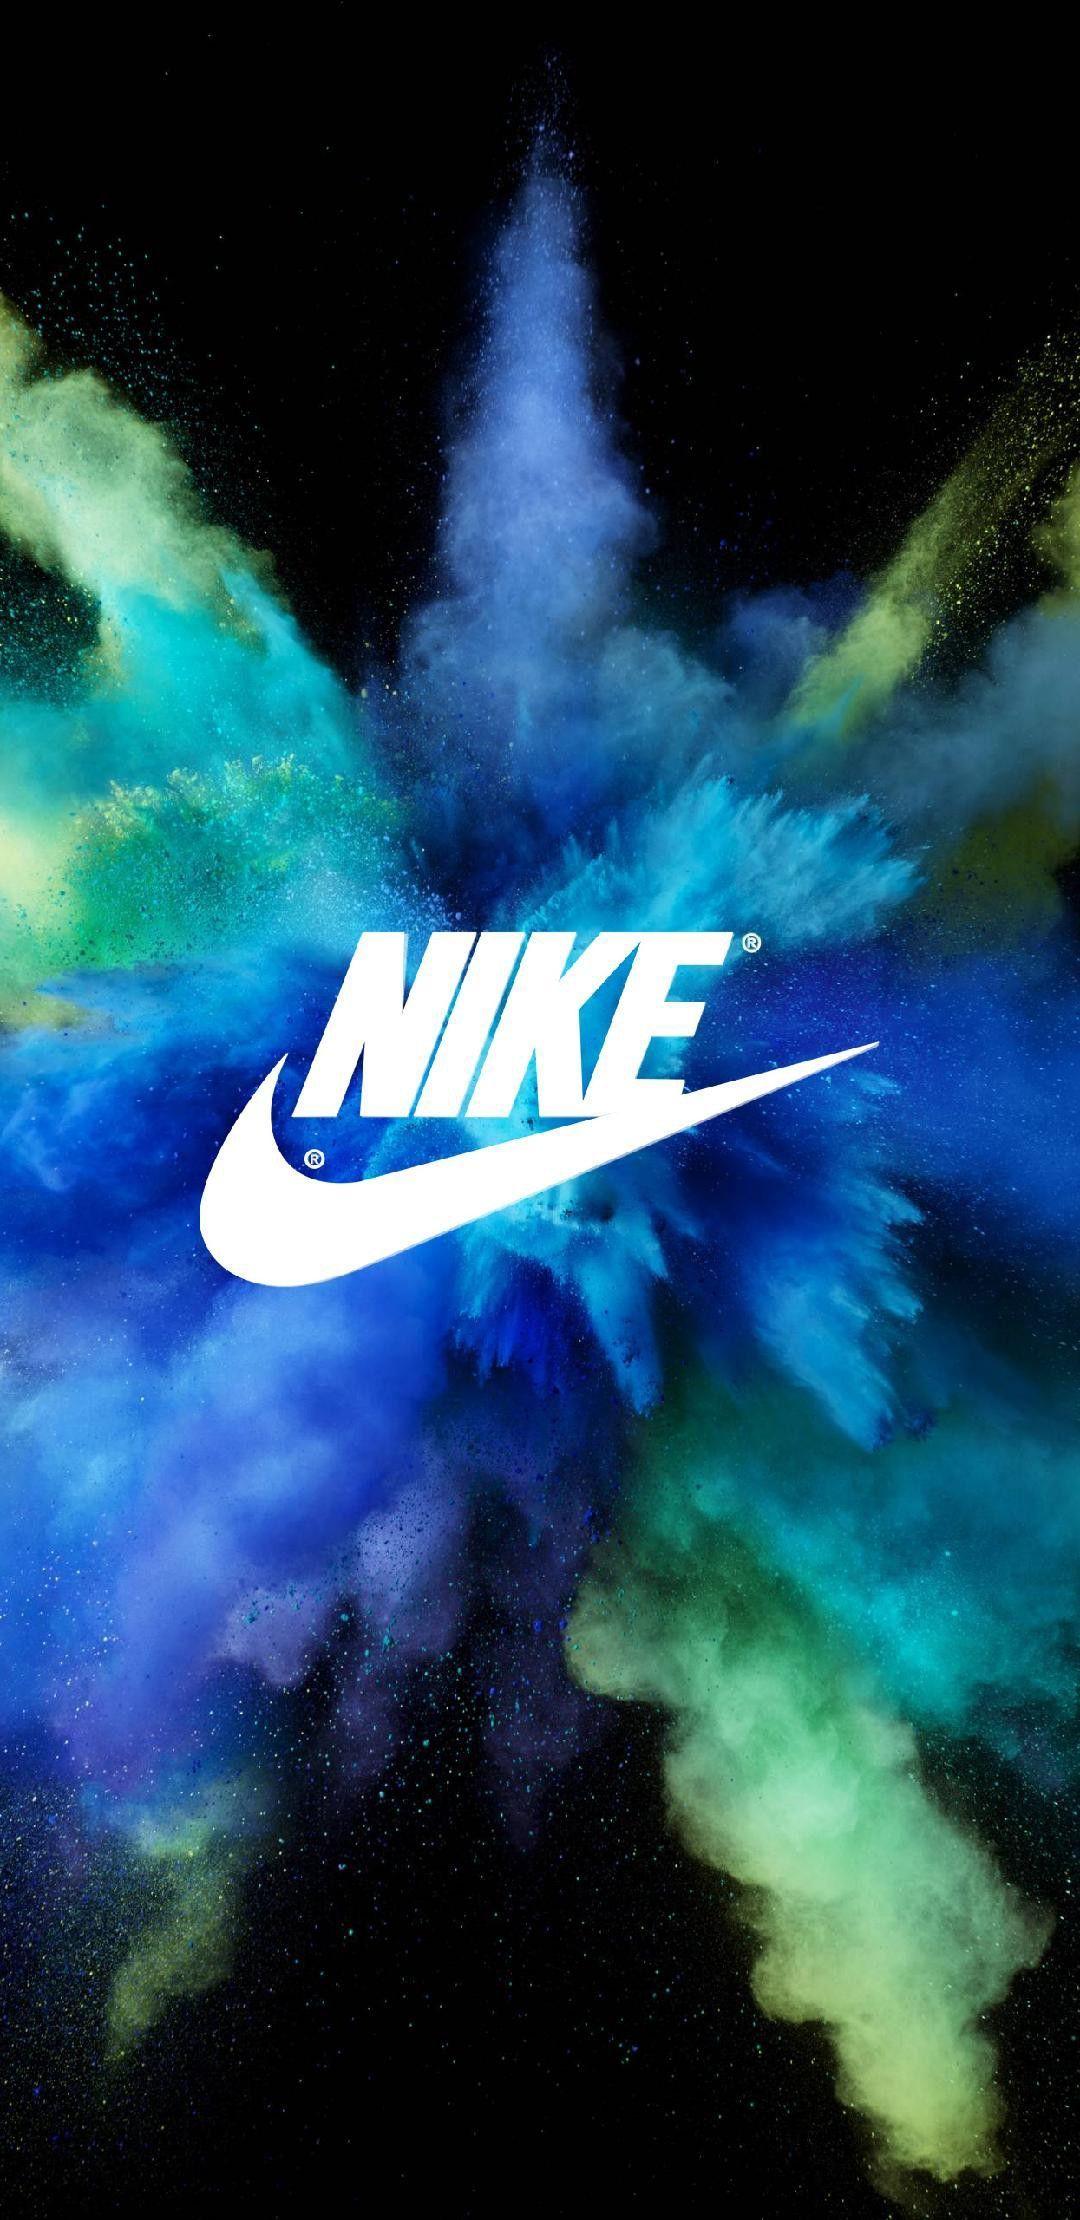 Cool Nike Logo Wallpaper | Wallpaper Nice in 2020 | Nike logo wallpapers, Nike wallpaper, Nike ...